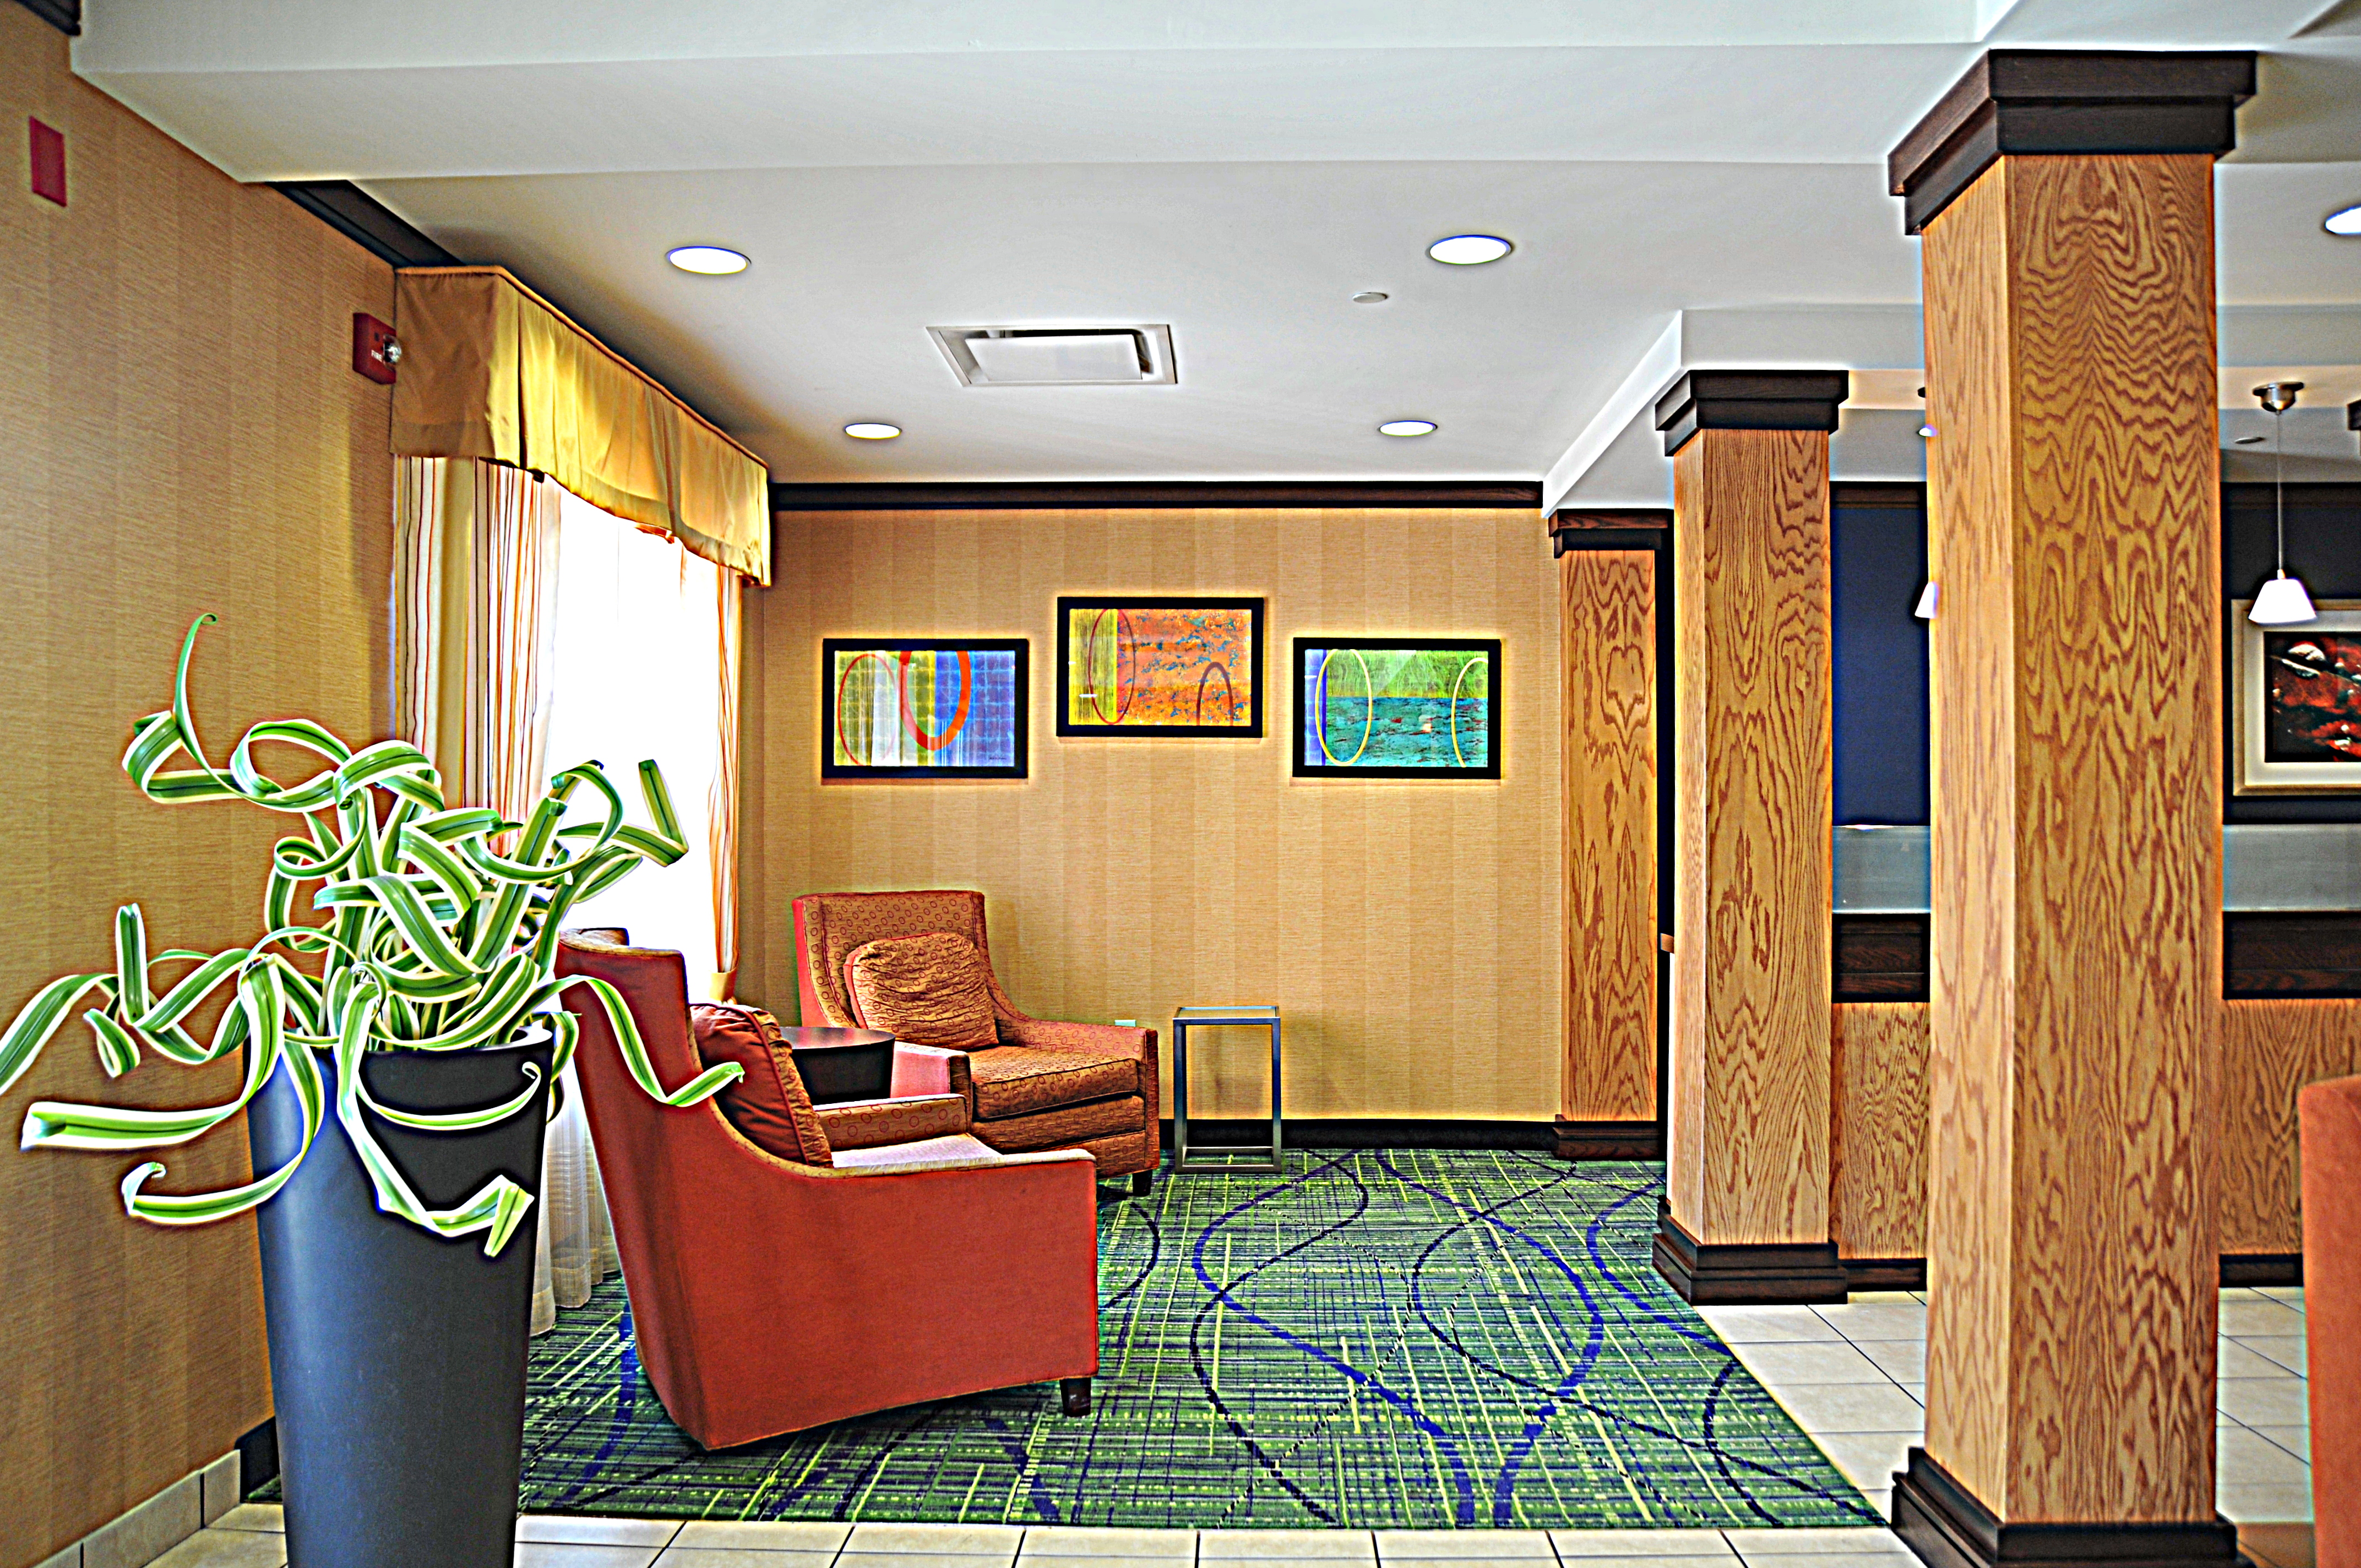 Fairfield Inn & Suites by Marriott Akron South image 45